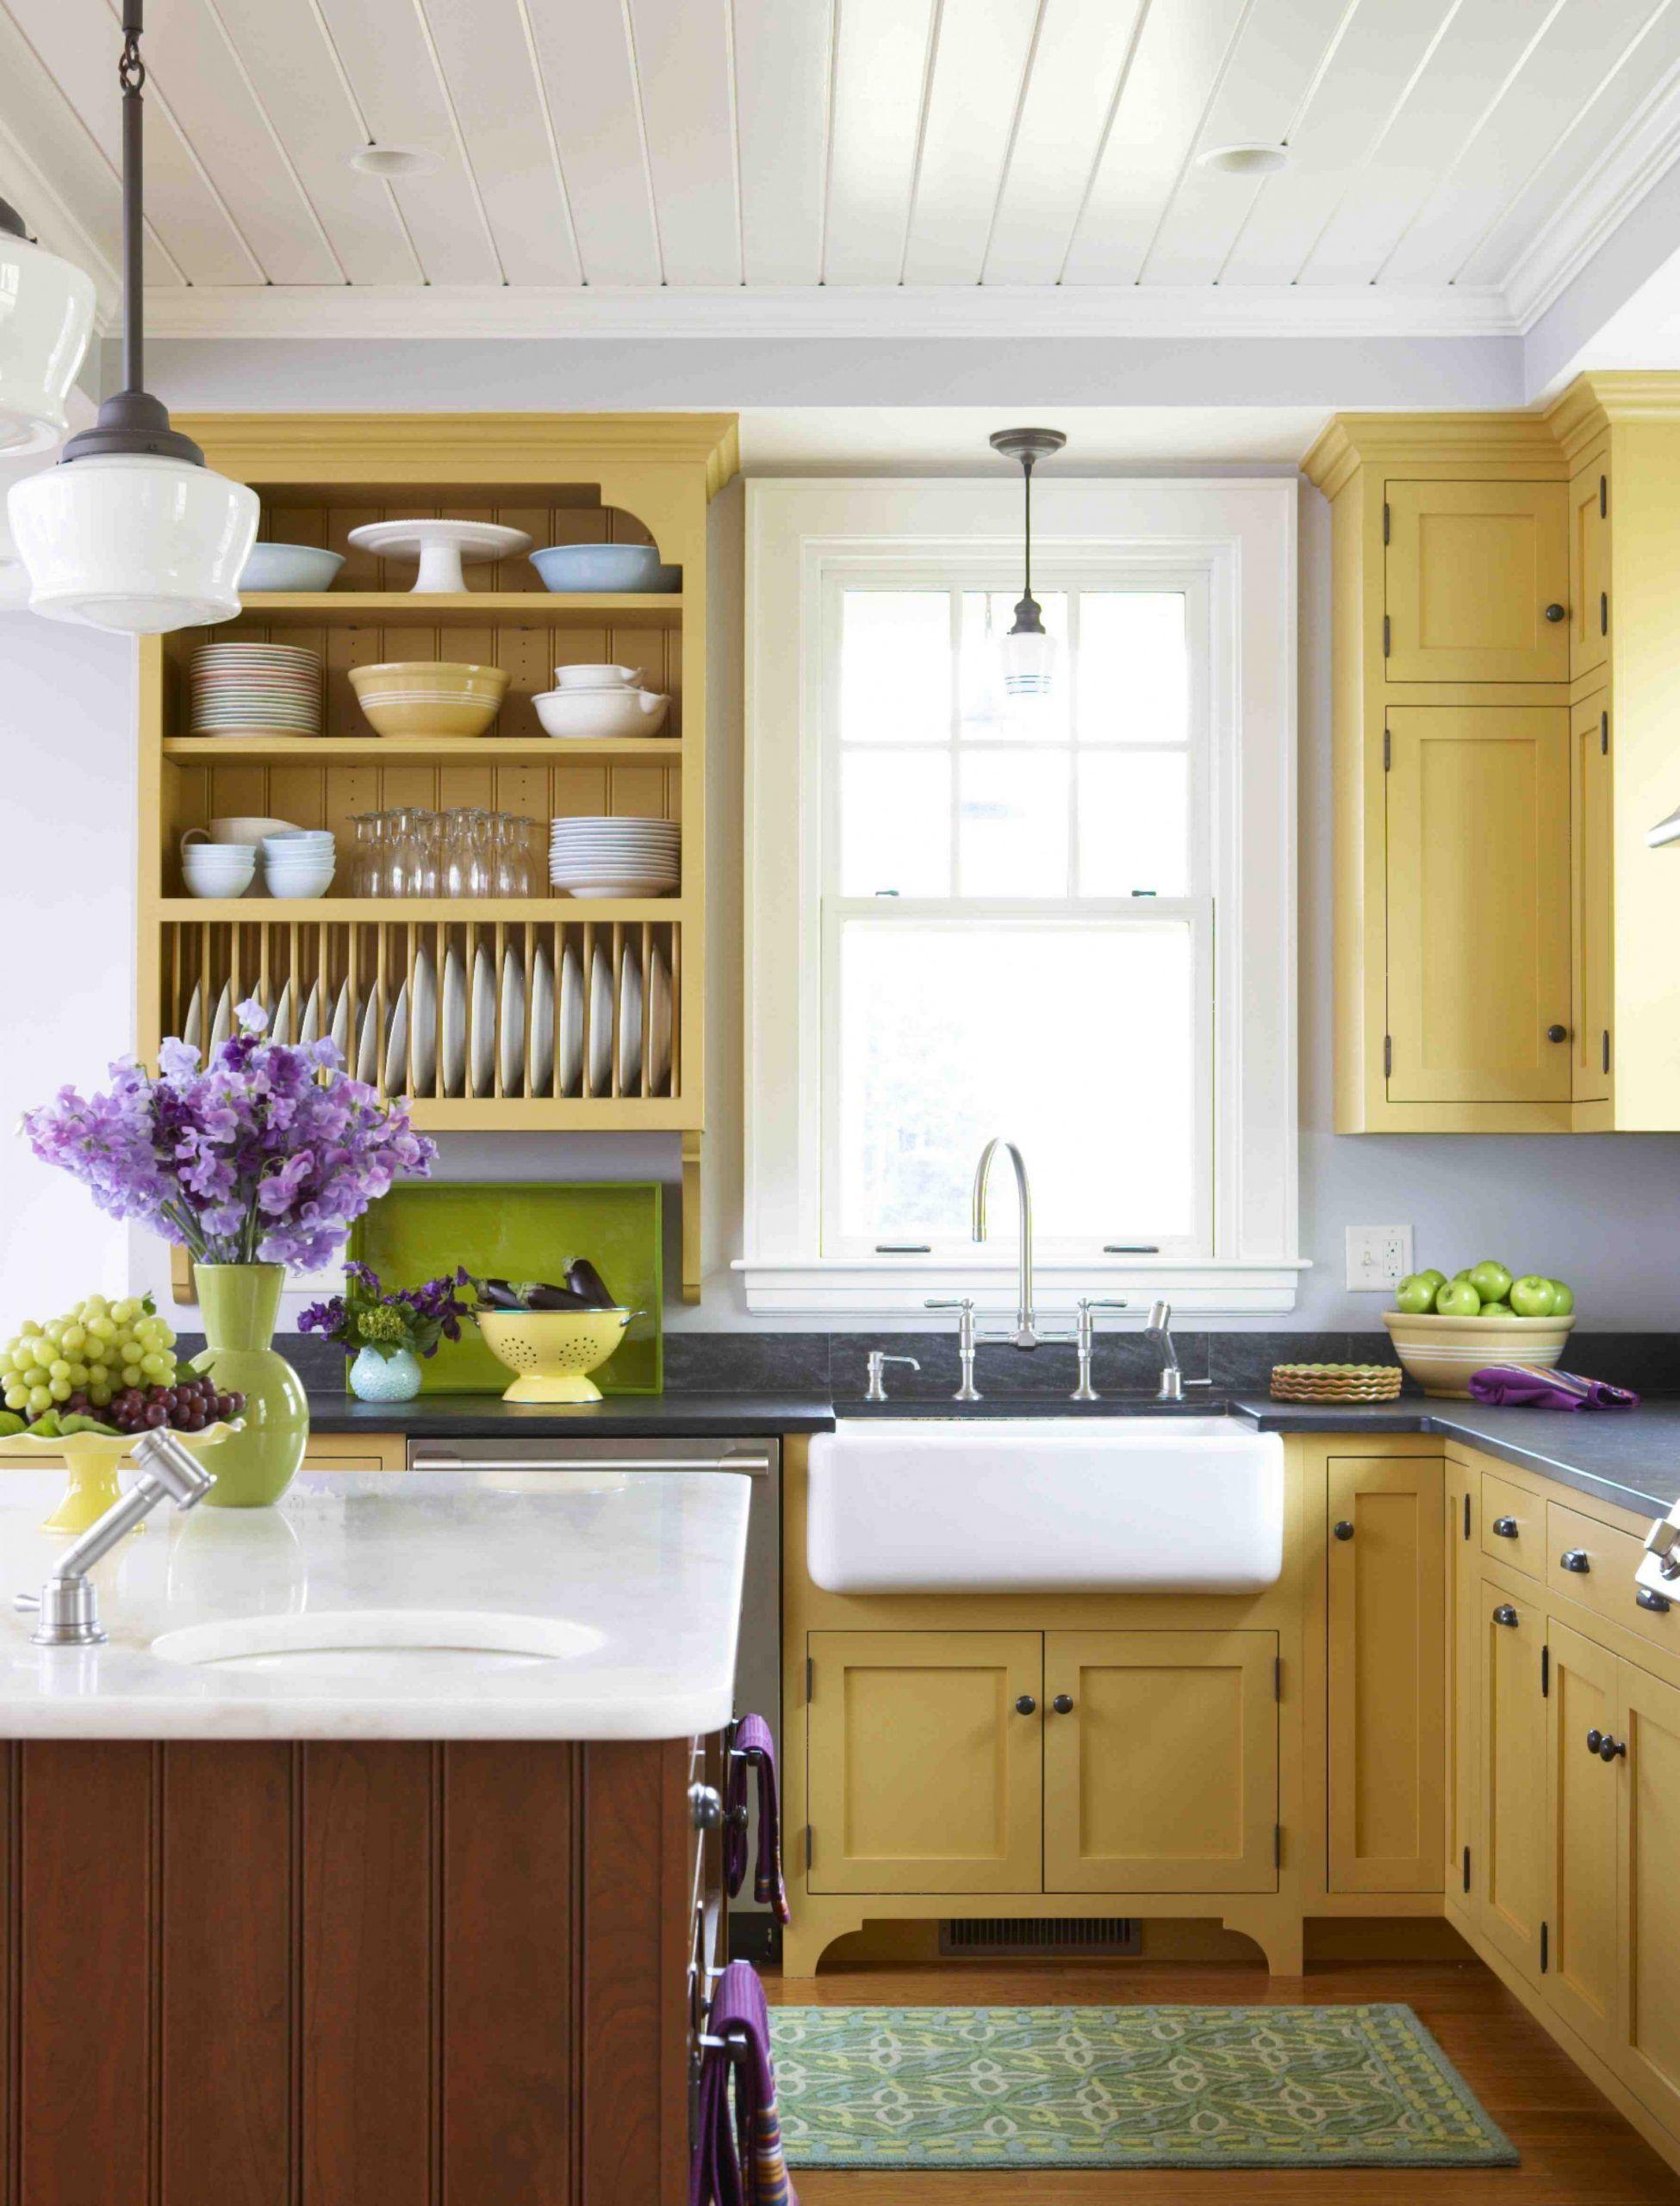 Butter Kitchen Cabinets Cottage Style Kitchen Cottage Kitchen Cabinets Cottage Kitchen Design